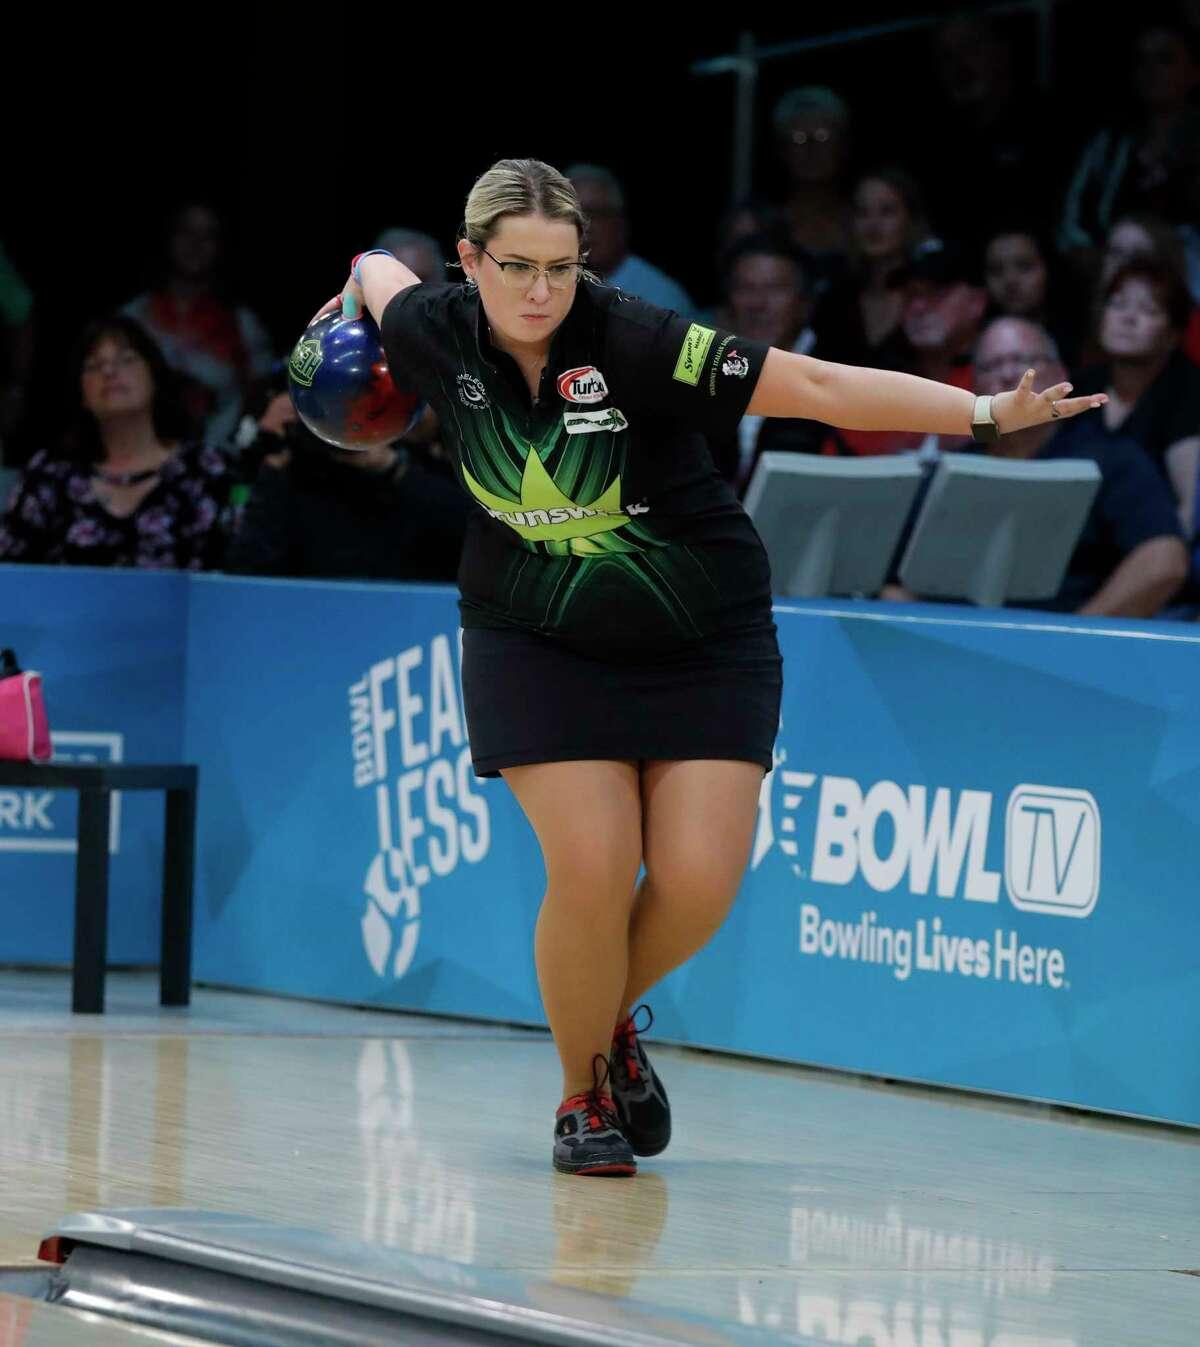 Liz Kuhlkin of Rotterdam, in action during the 2019 PWBA season. (PWBA photo)